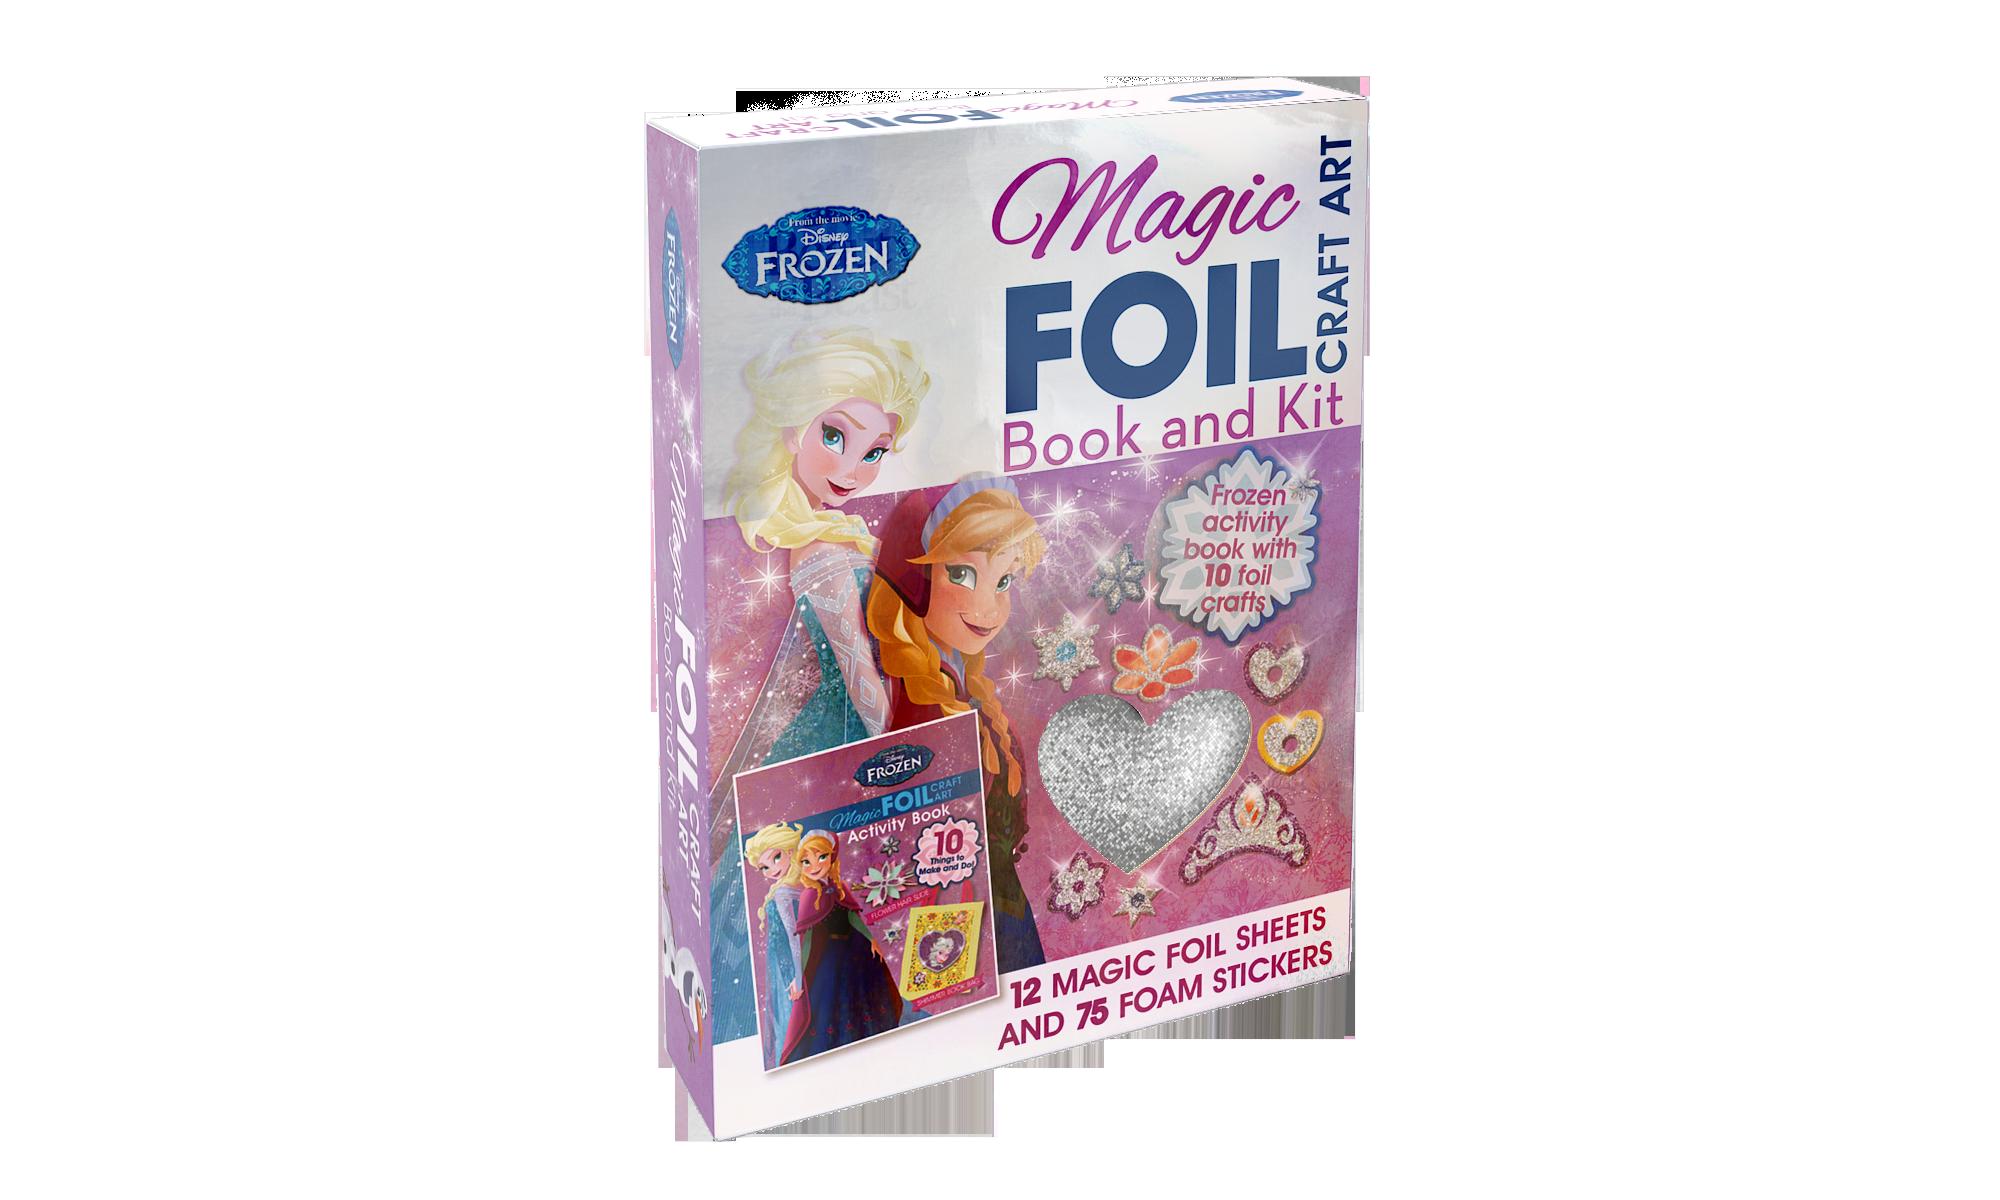 Frozen - Magic Foil Art - Pack